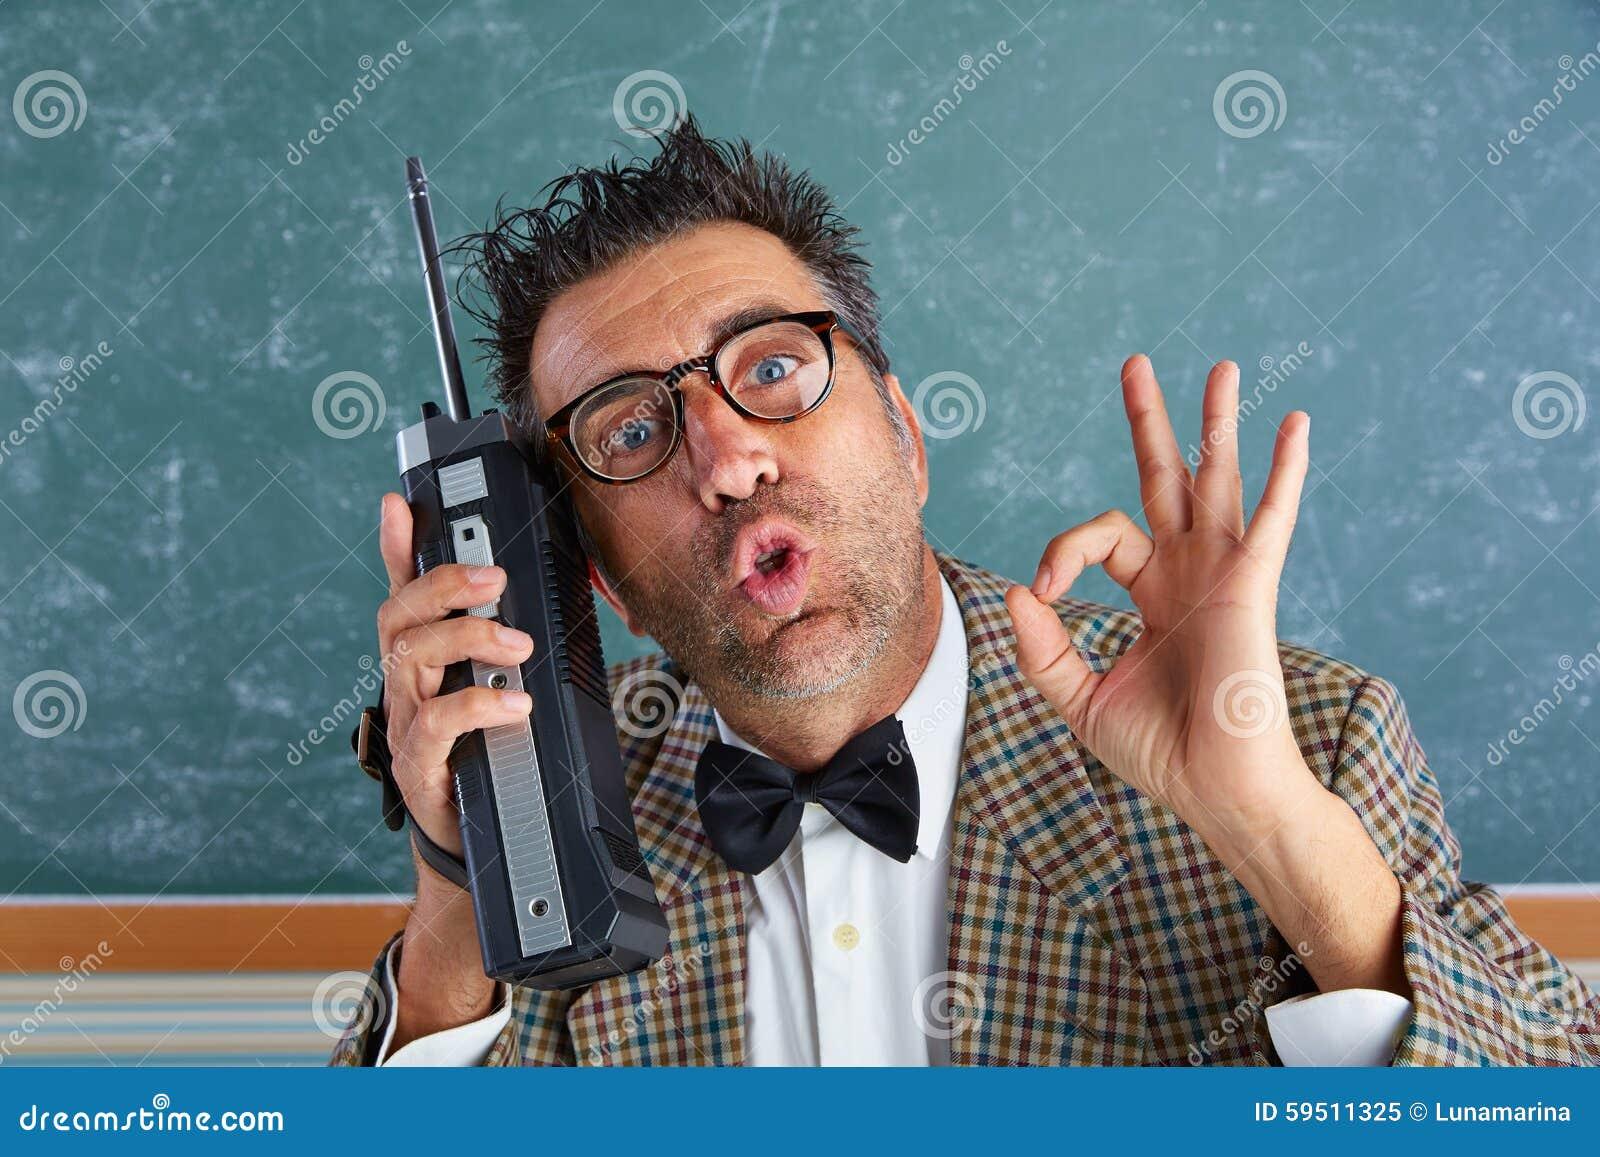 Звуковое кино walkie придурковатого частного детектива болвана ретро